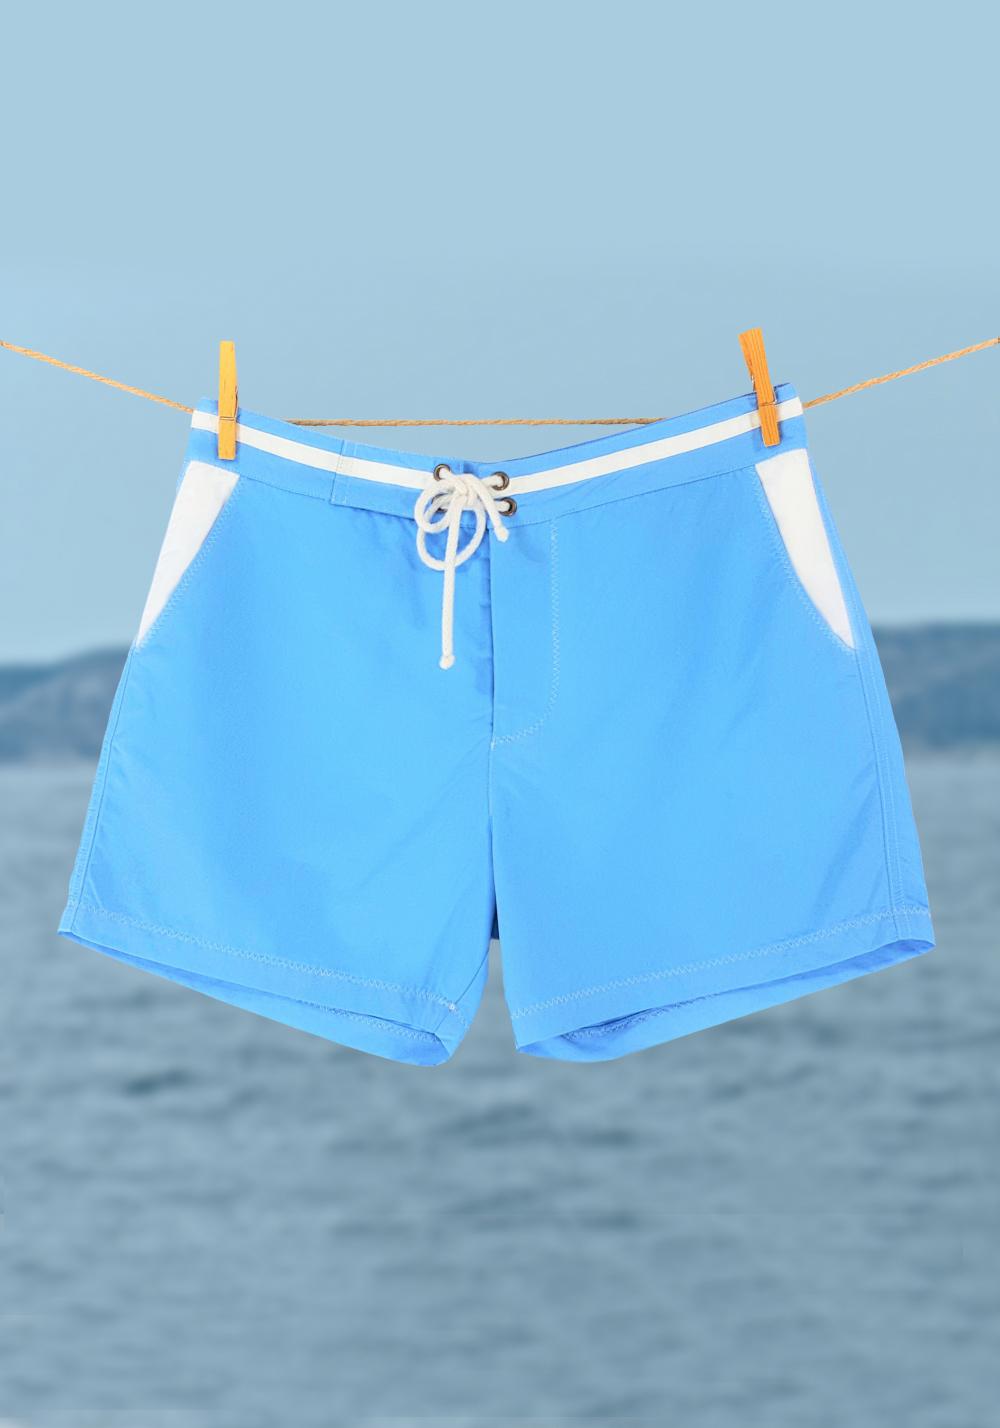 Bluebuck Swim Trunk